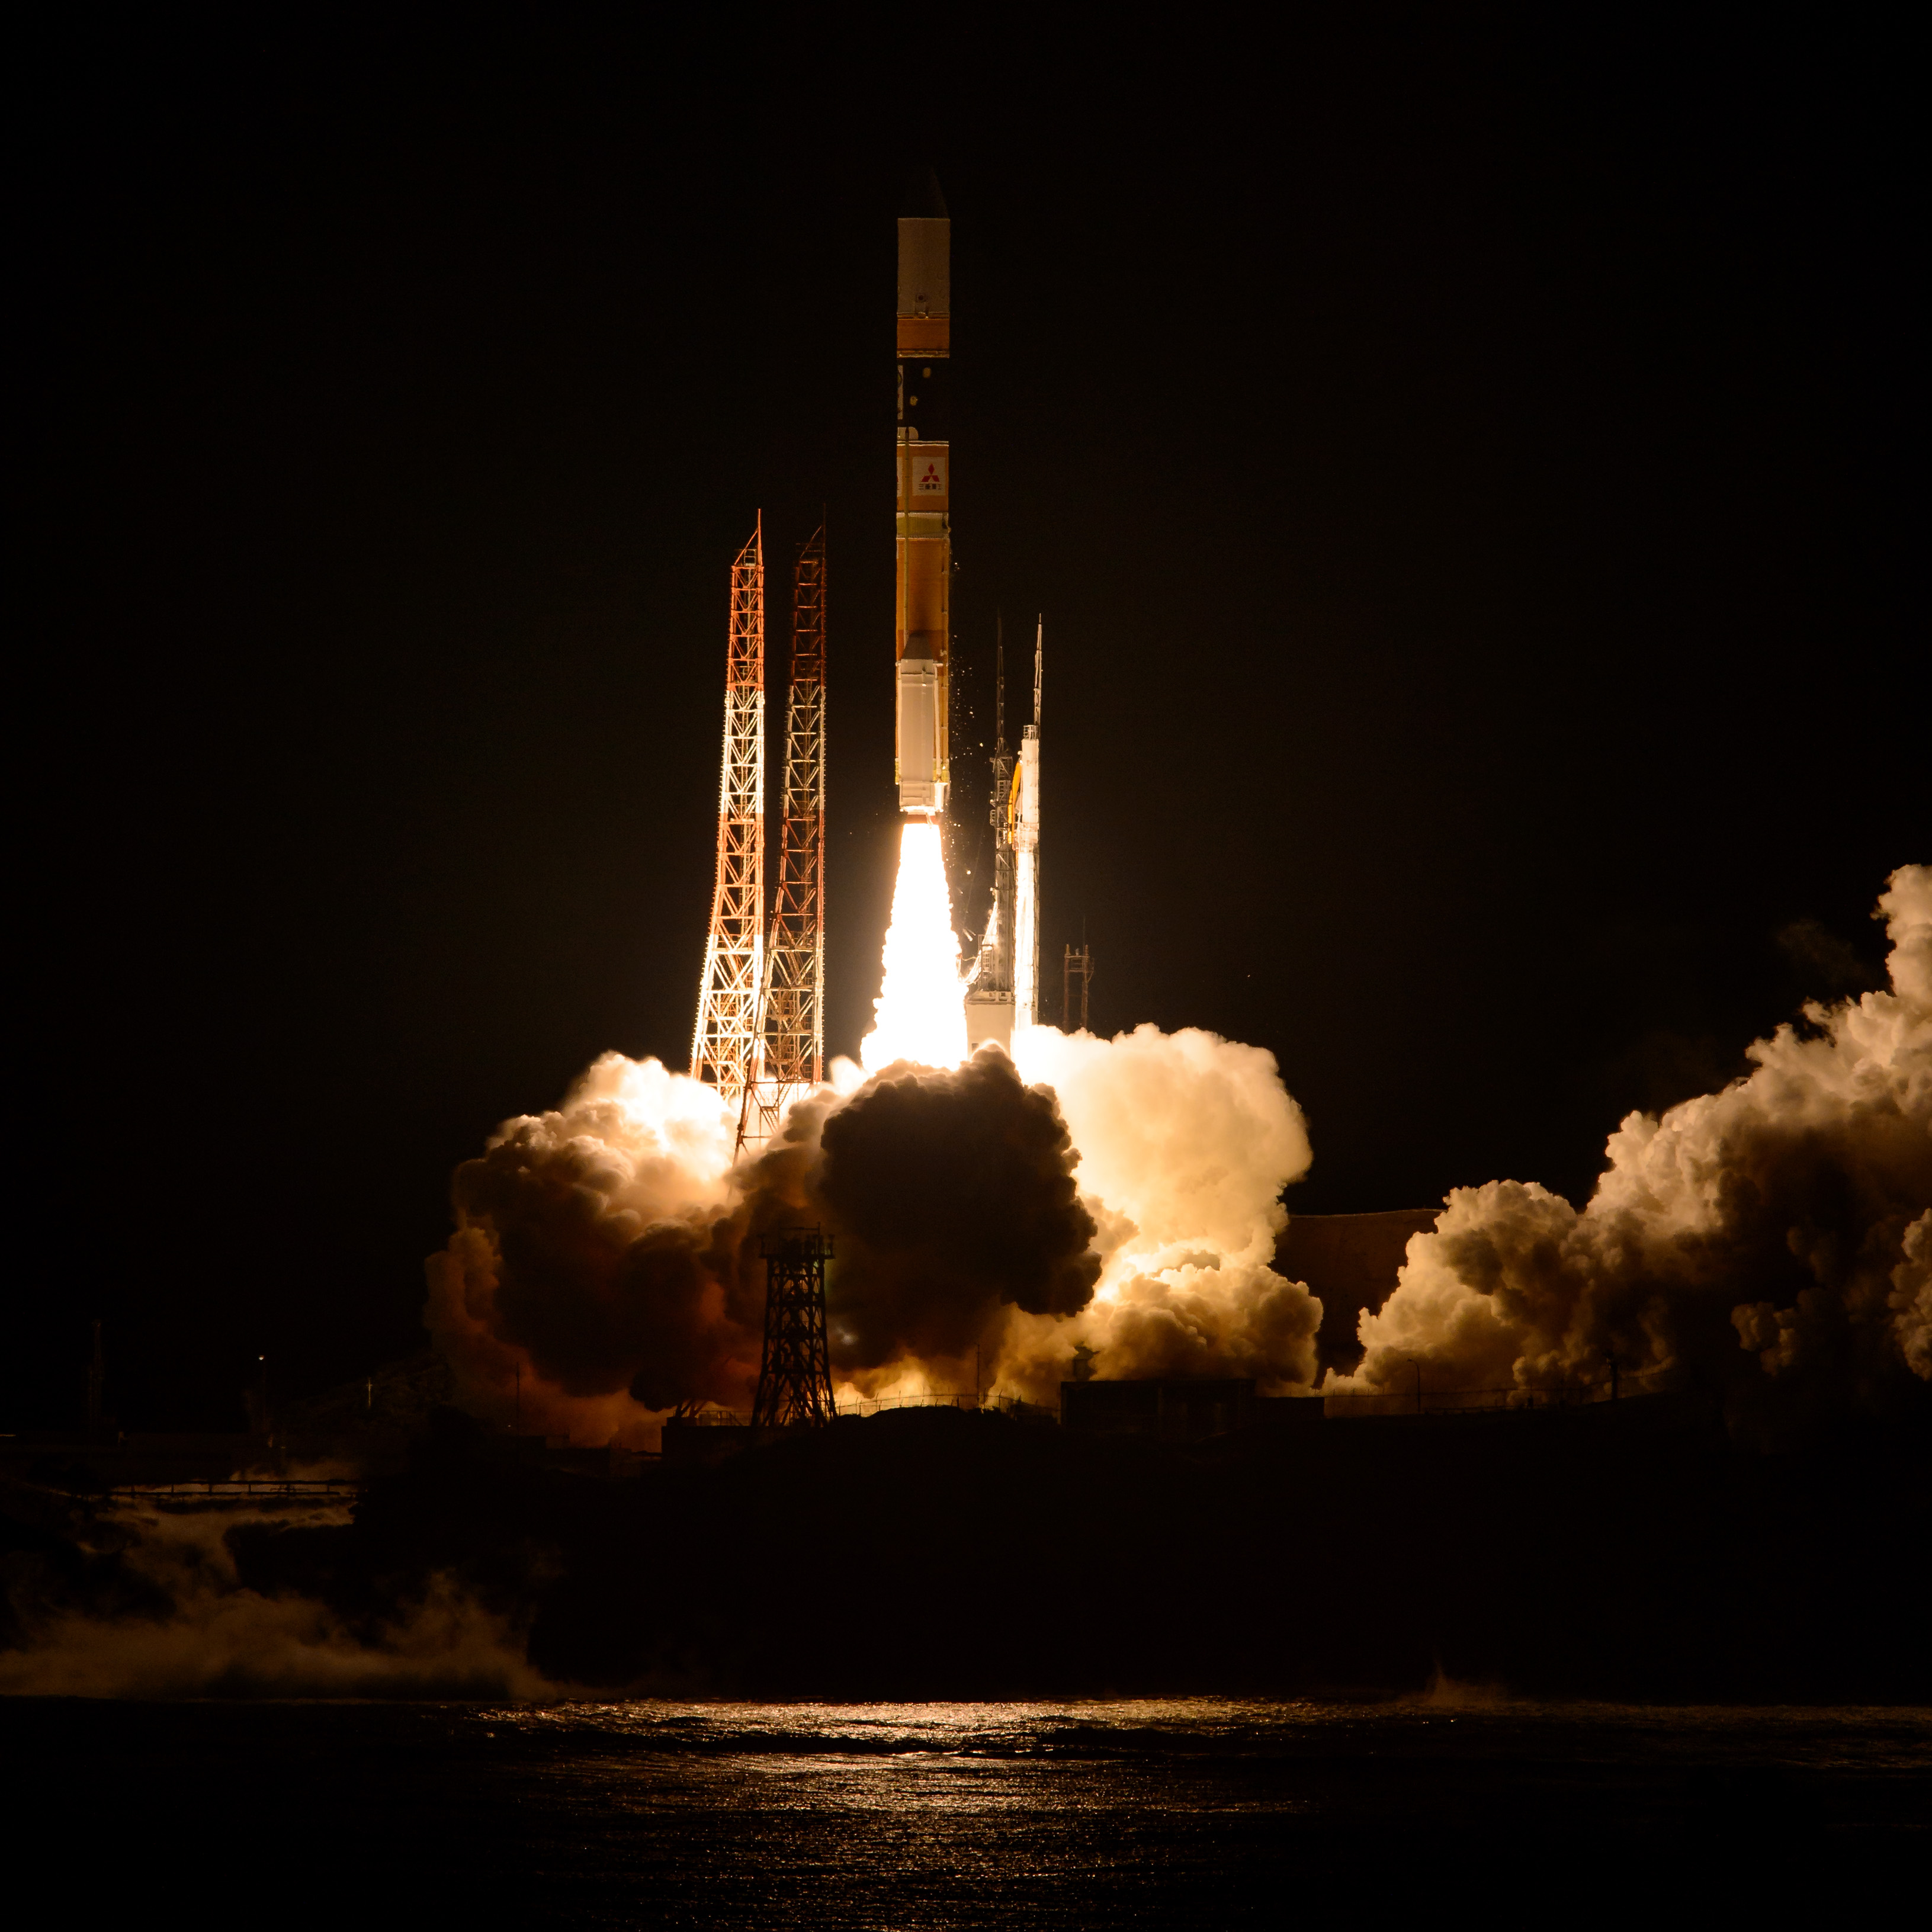 Japan Launches Next-Generation NASA Satellite to Track Rain & Snow